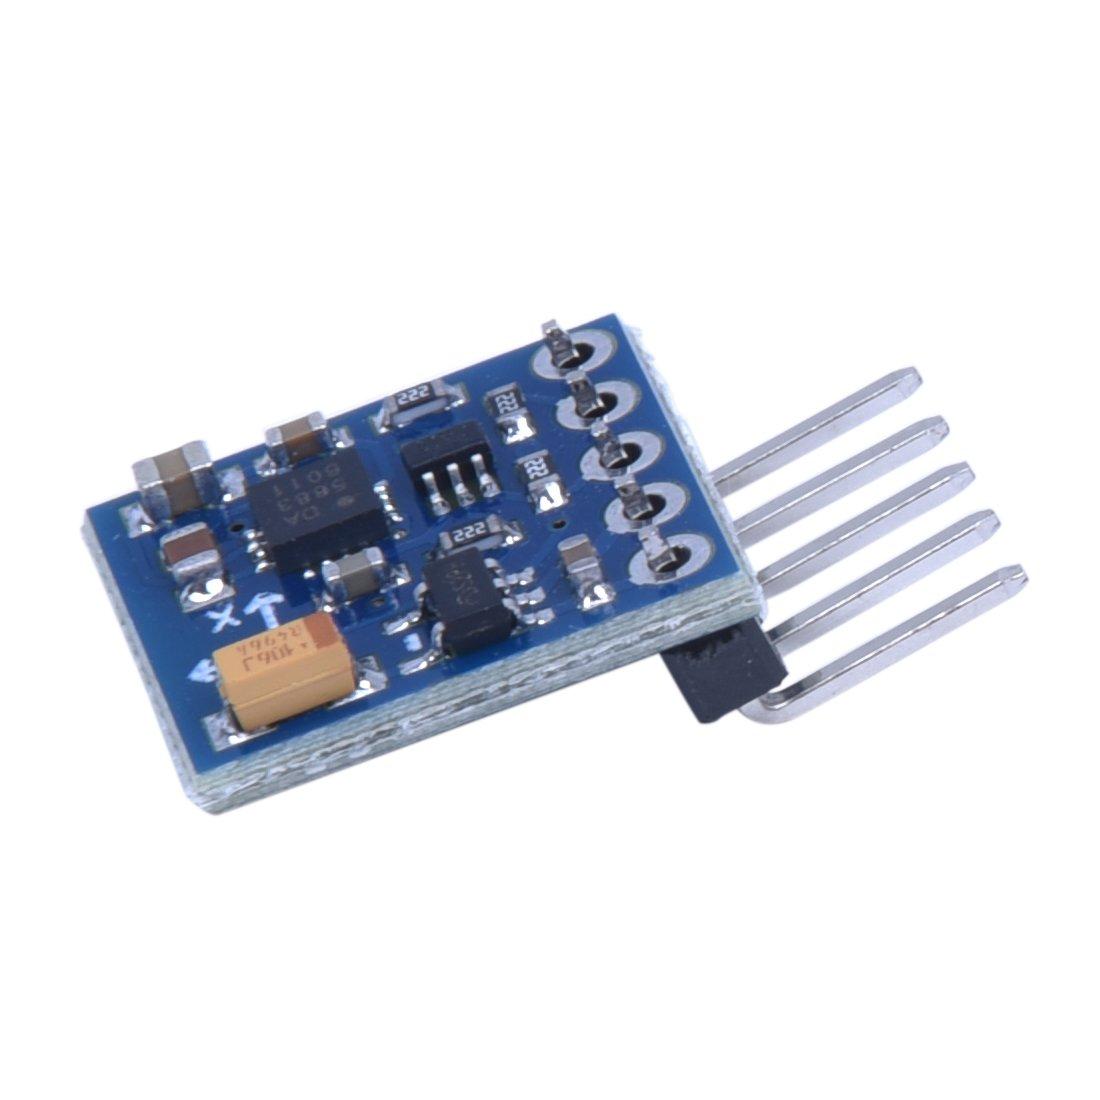 TOOGOO(R) HMC5883L Power supply:3V-5V Triple Axis Compass Magnetometer Sensor Module by TOOGOO(R) (Image #1)